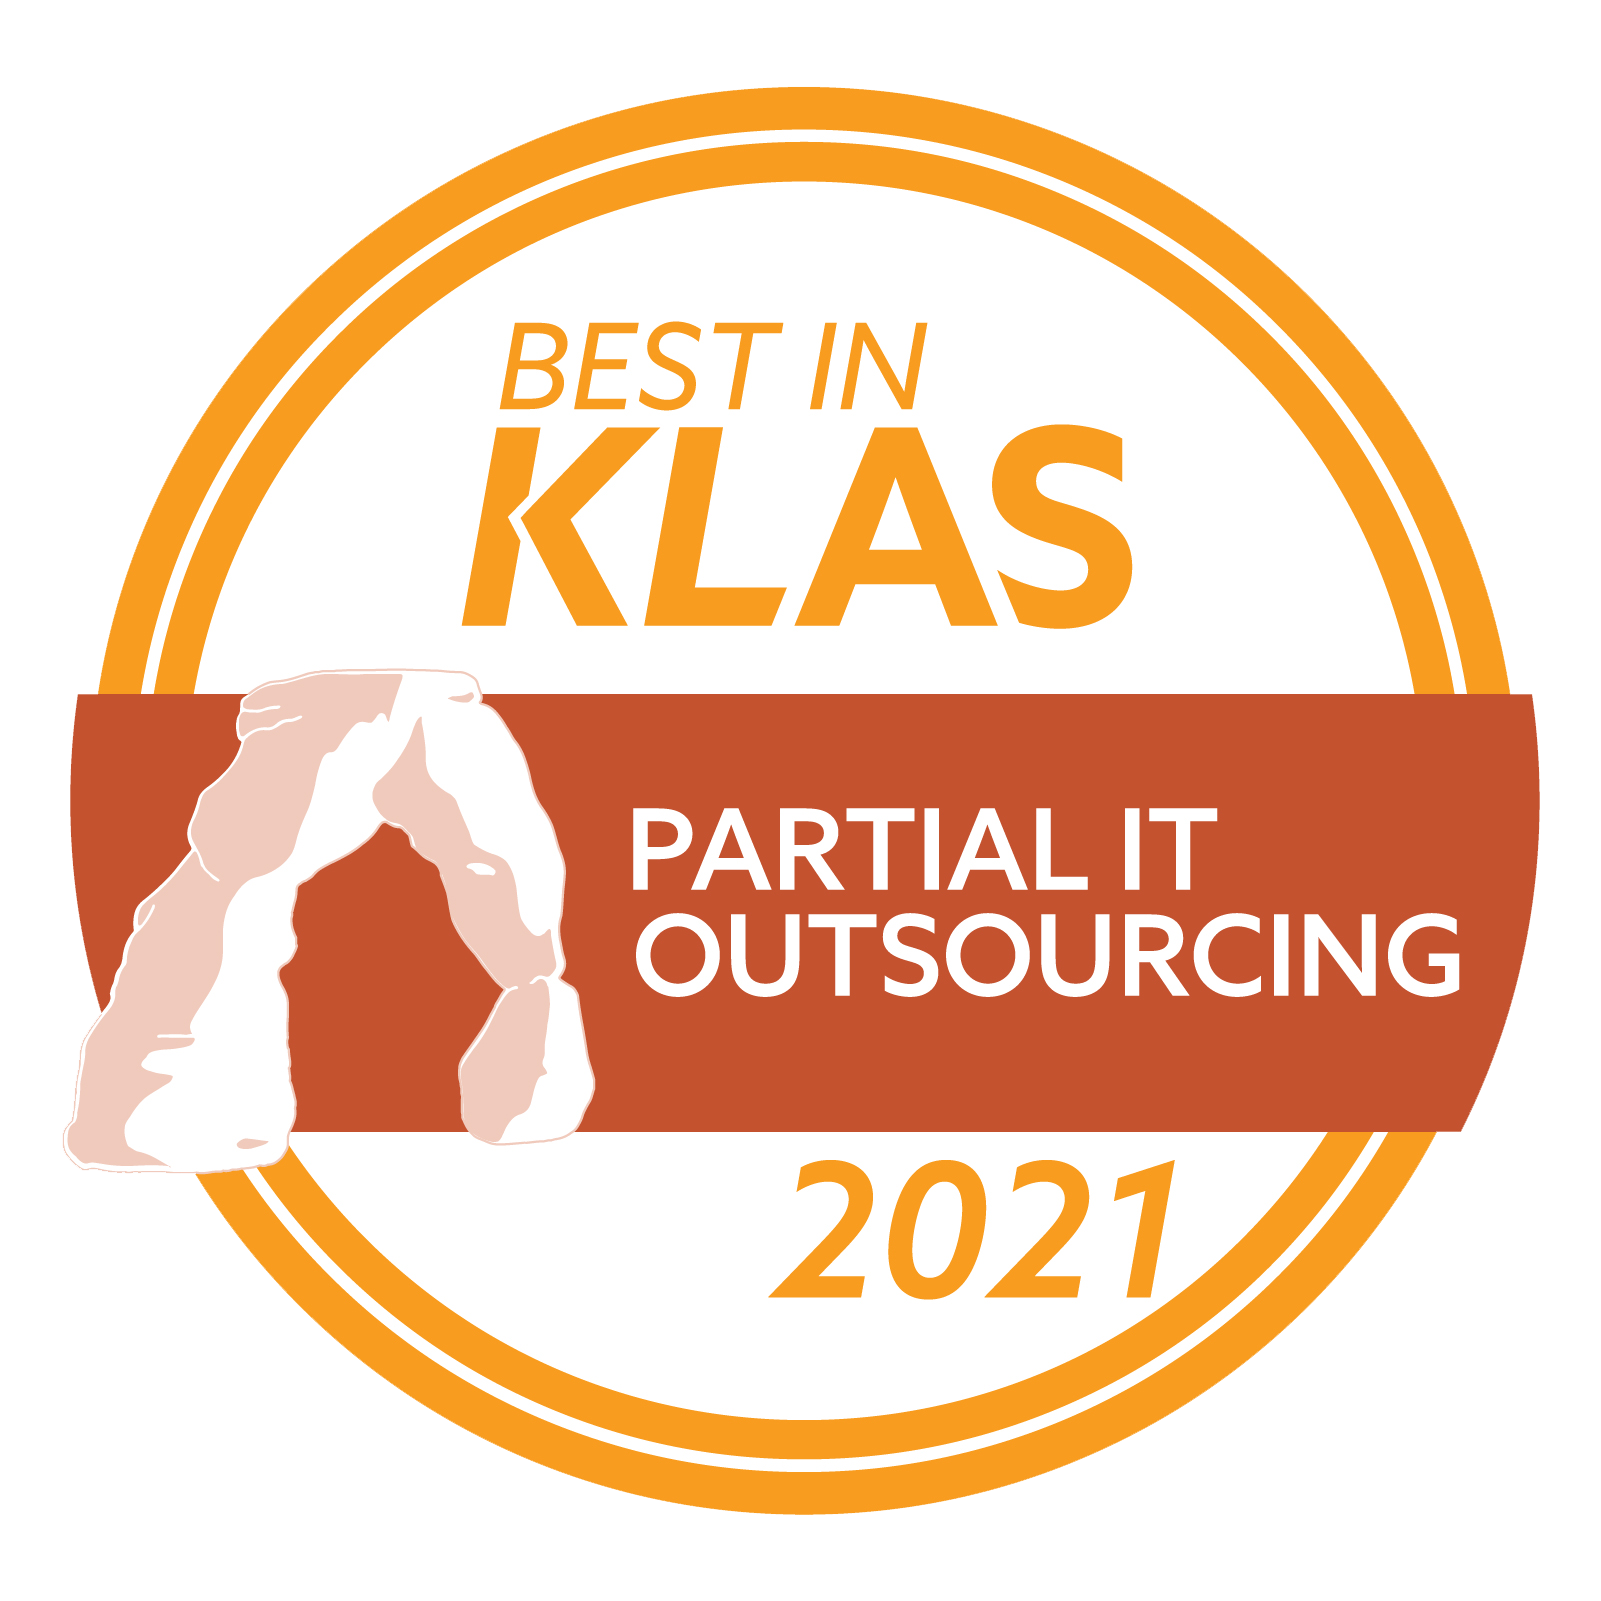 2021 Best in KLAS Partial IT Outsourcing